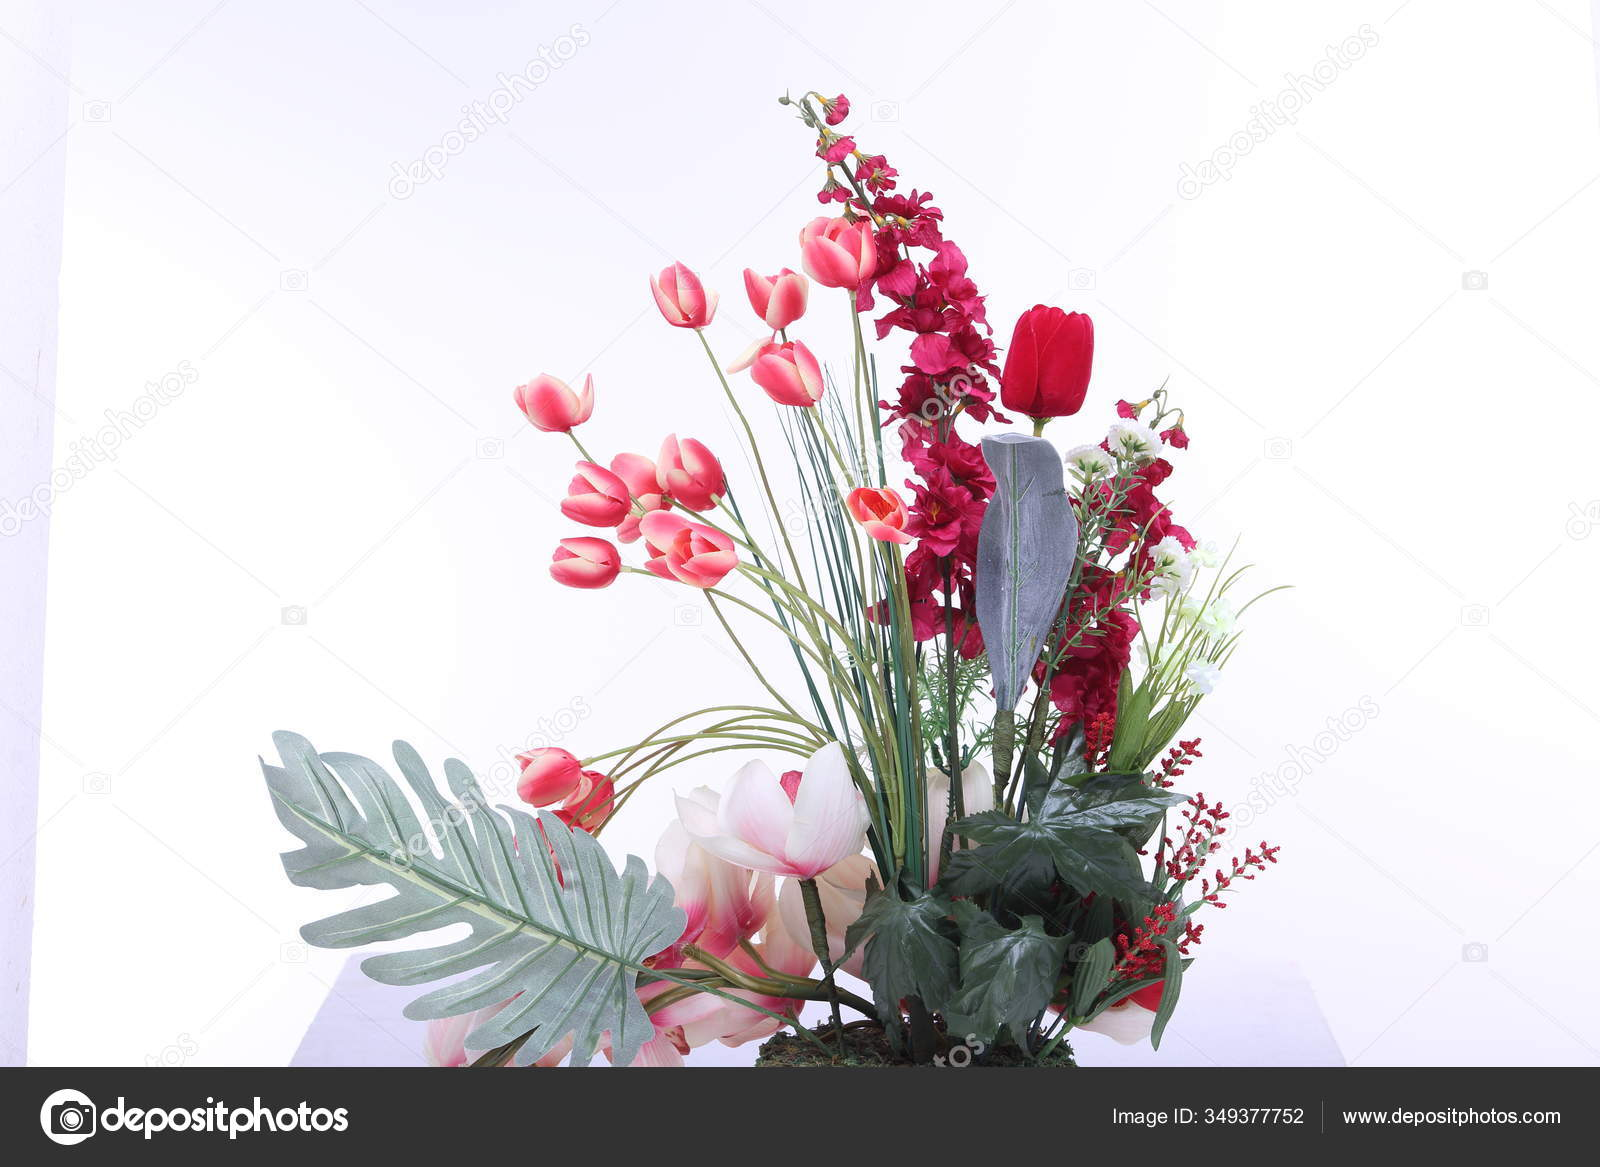 Bouquet Red Pink Many Kind Flower Vase Jar Artificial Studio Stock Photo C Jadethaicatwalk 349377752